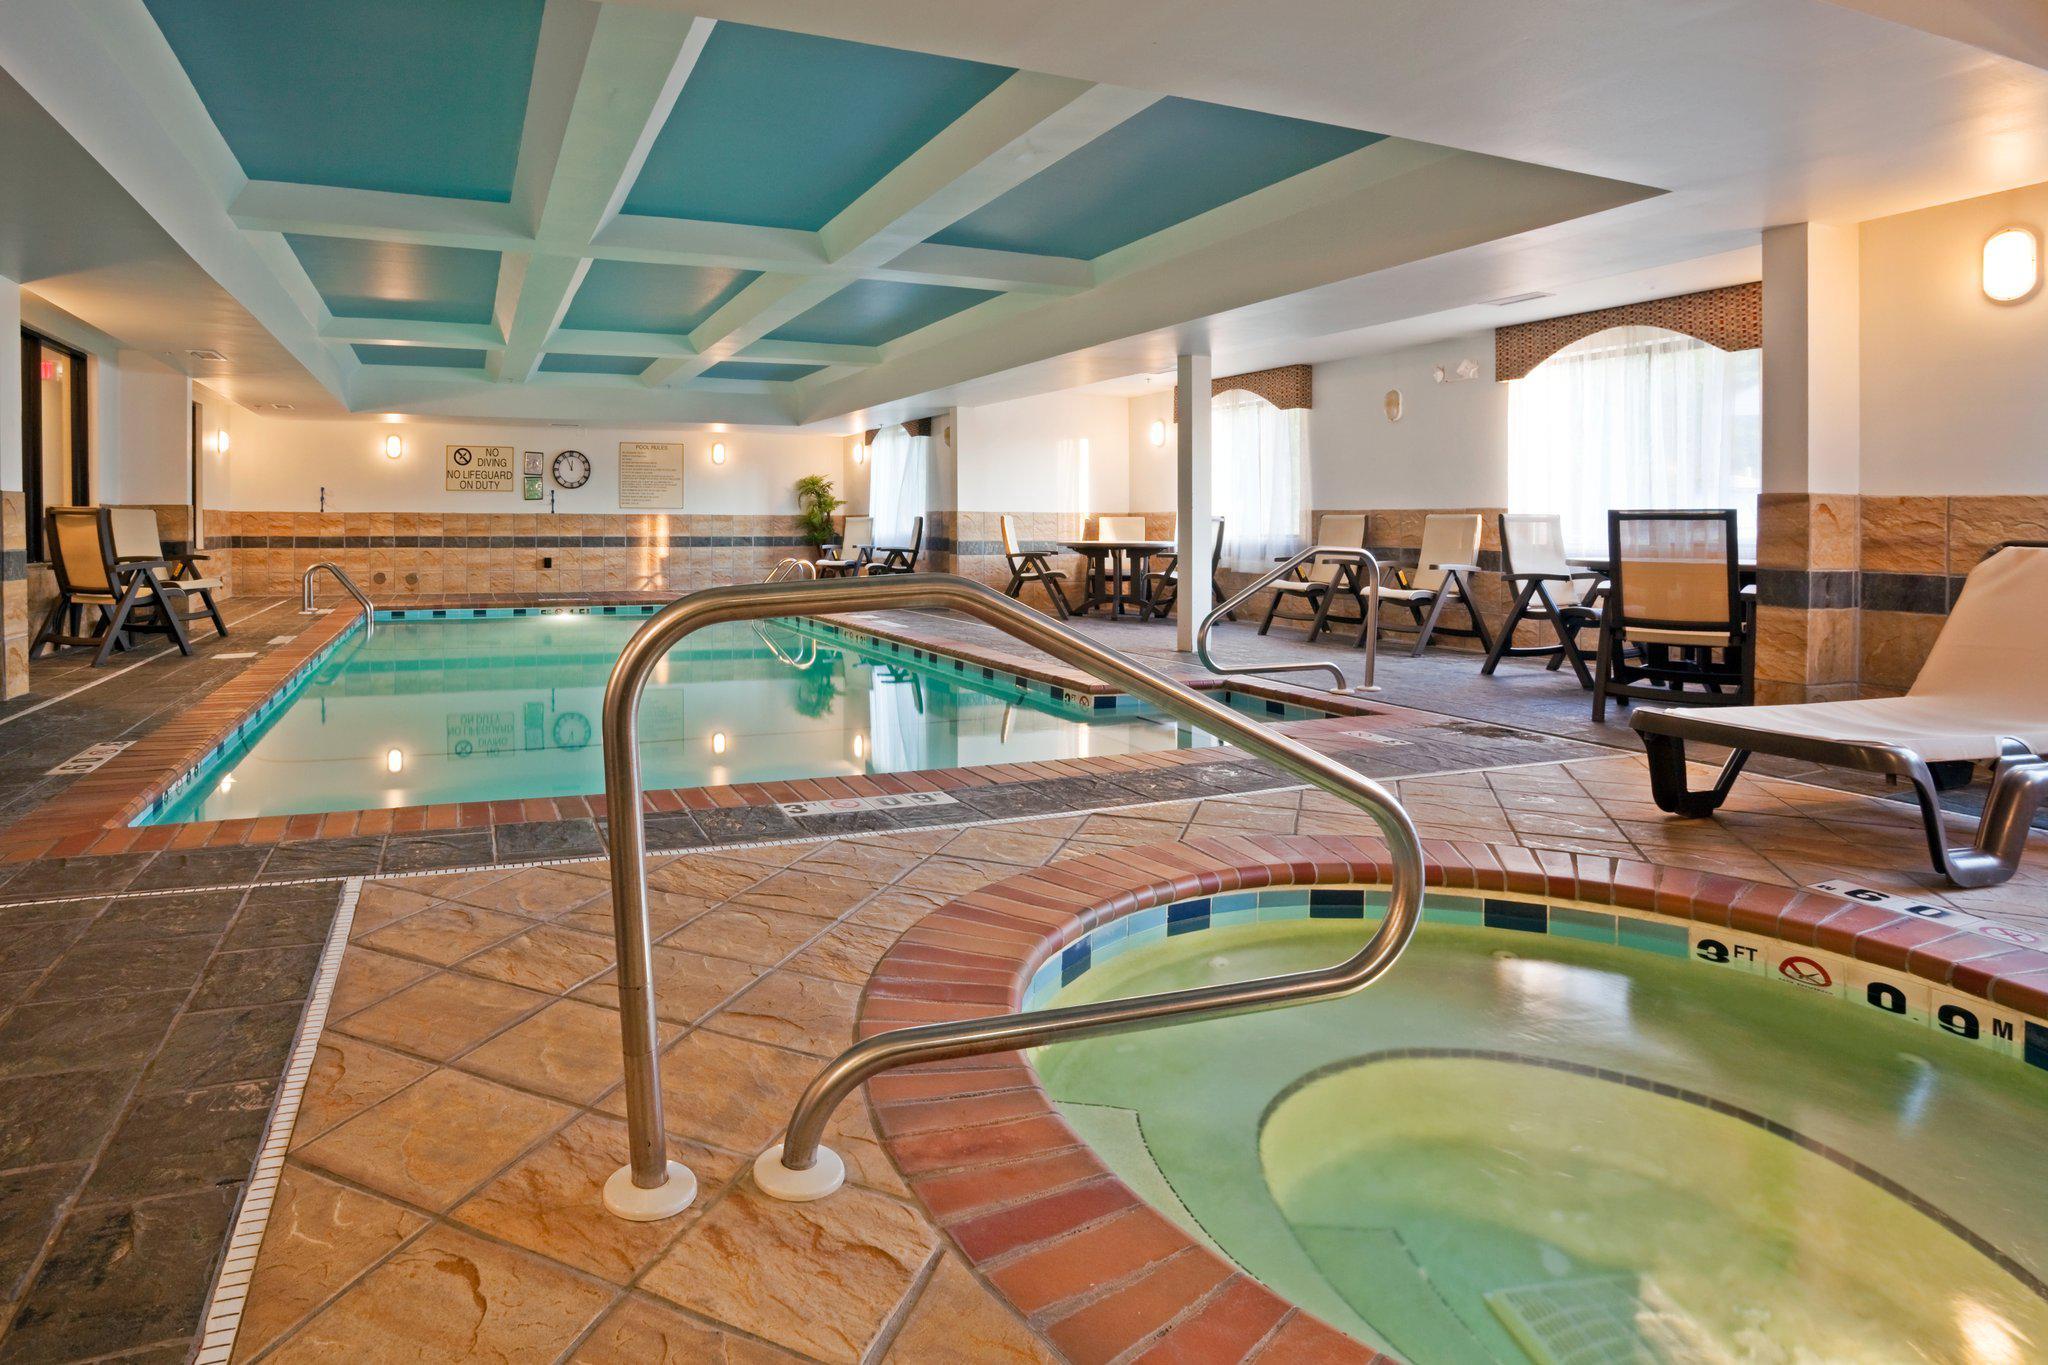 Holiday Inn Express Amp Suites Birmingham Inverness 280